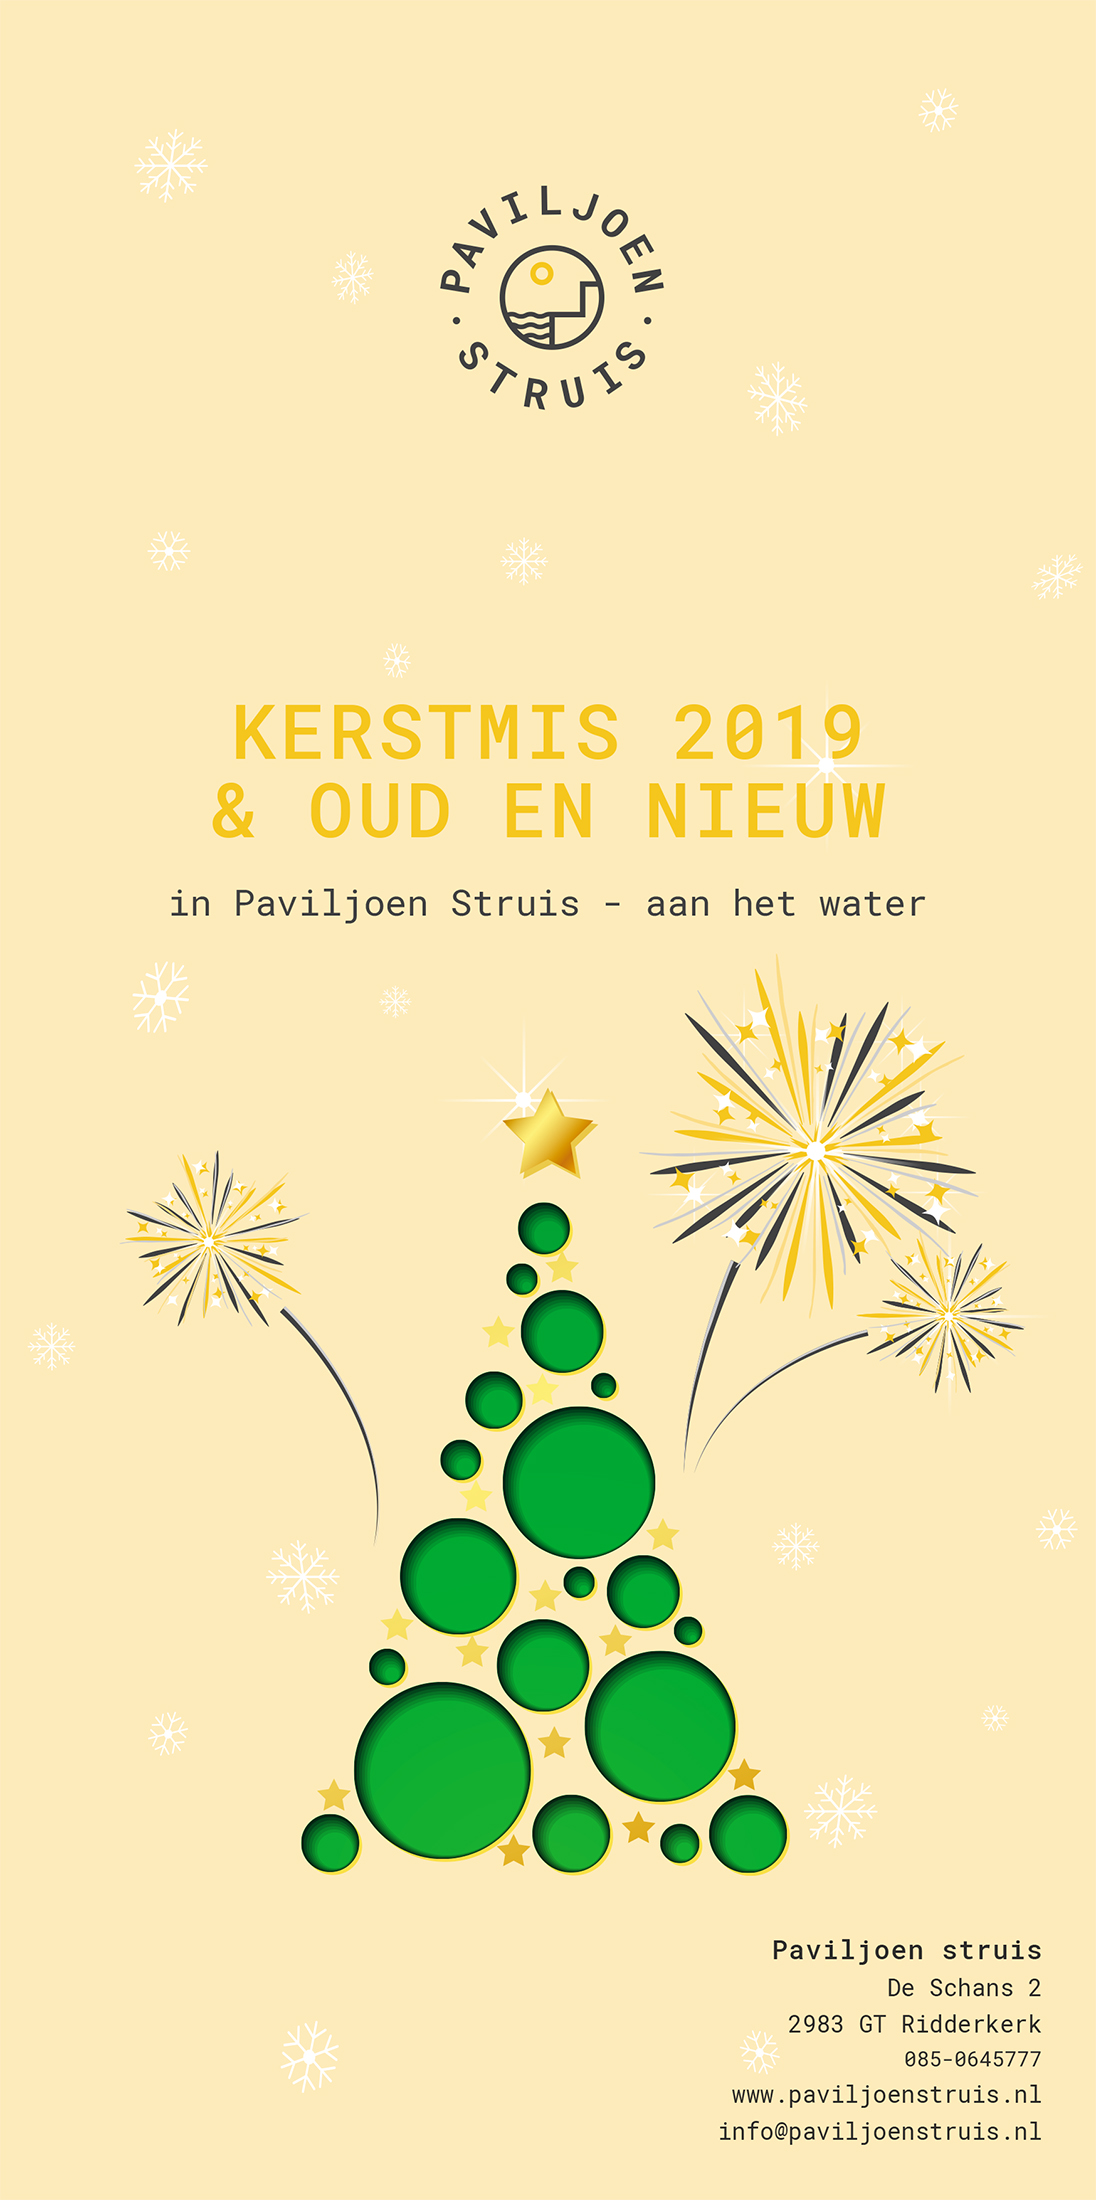 STRUIS_FEESTDAGEN_2019-1